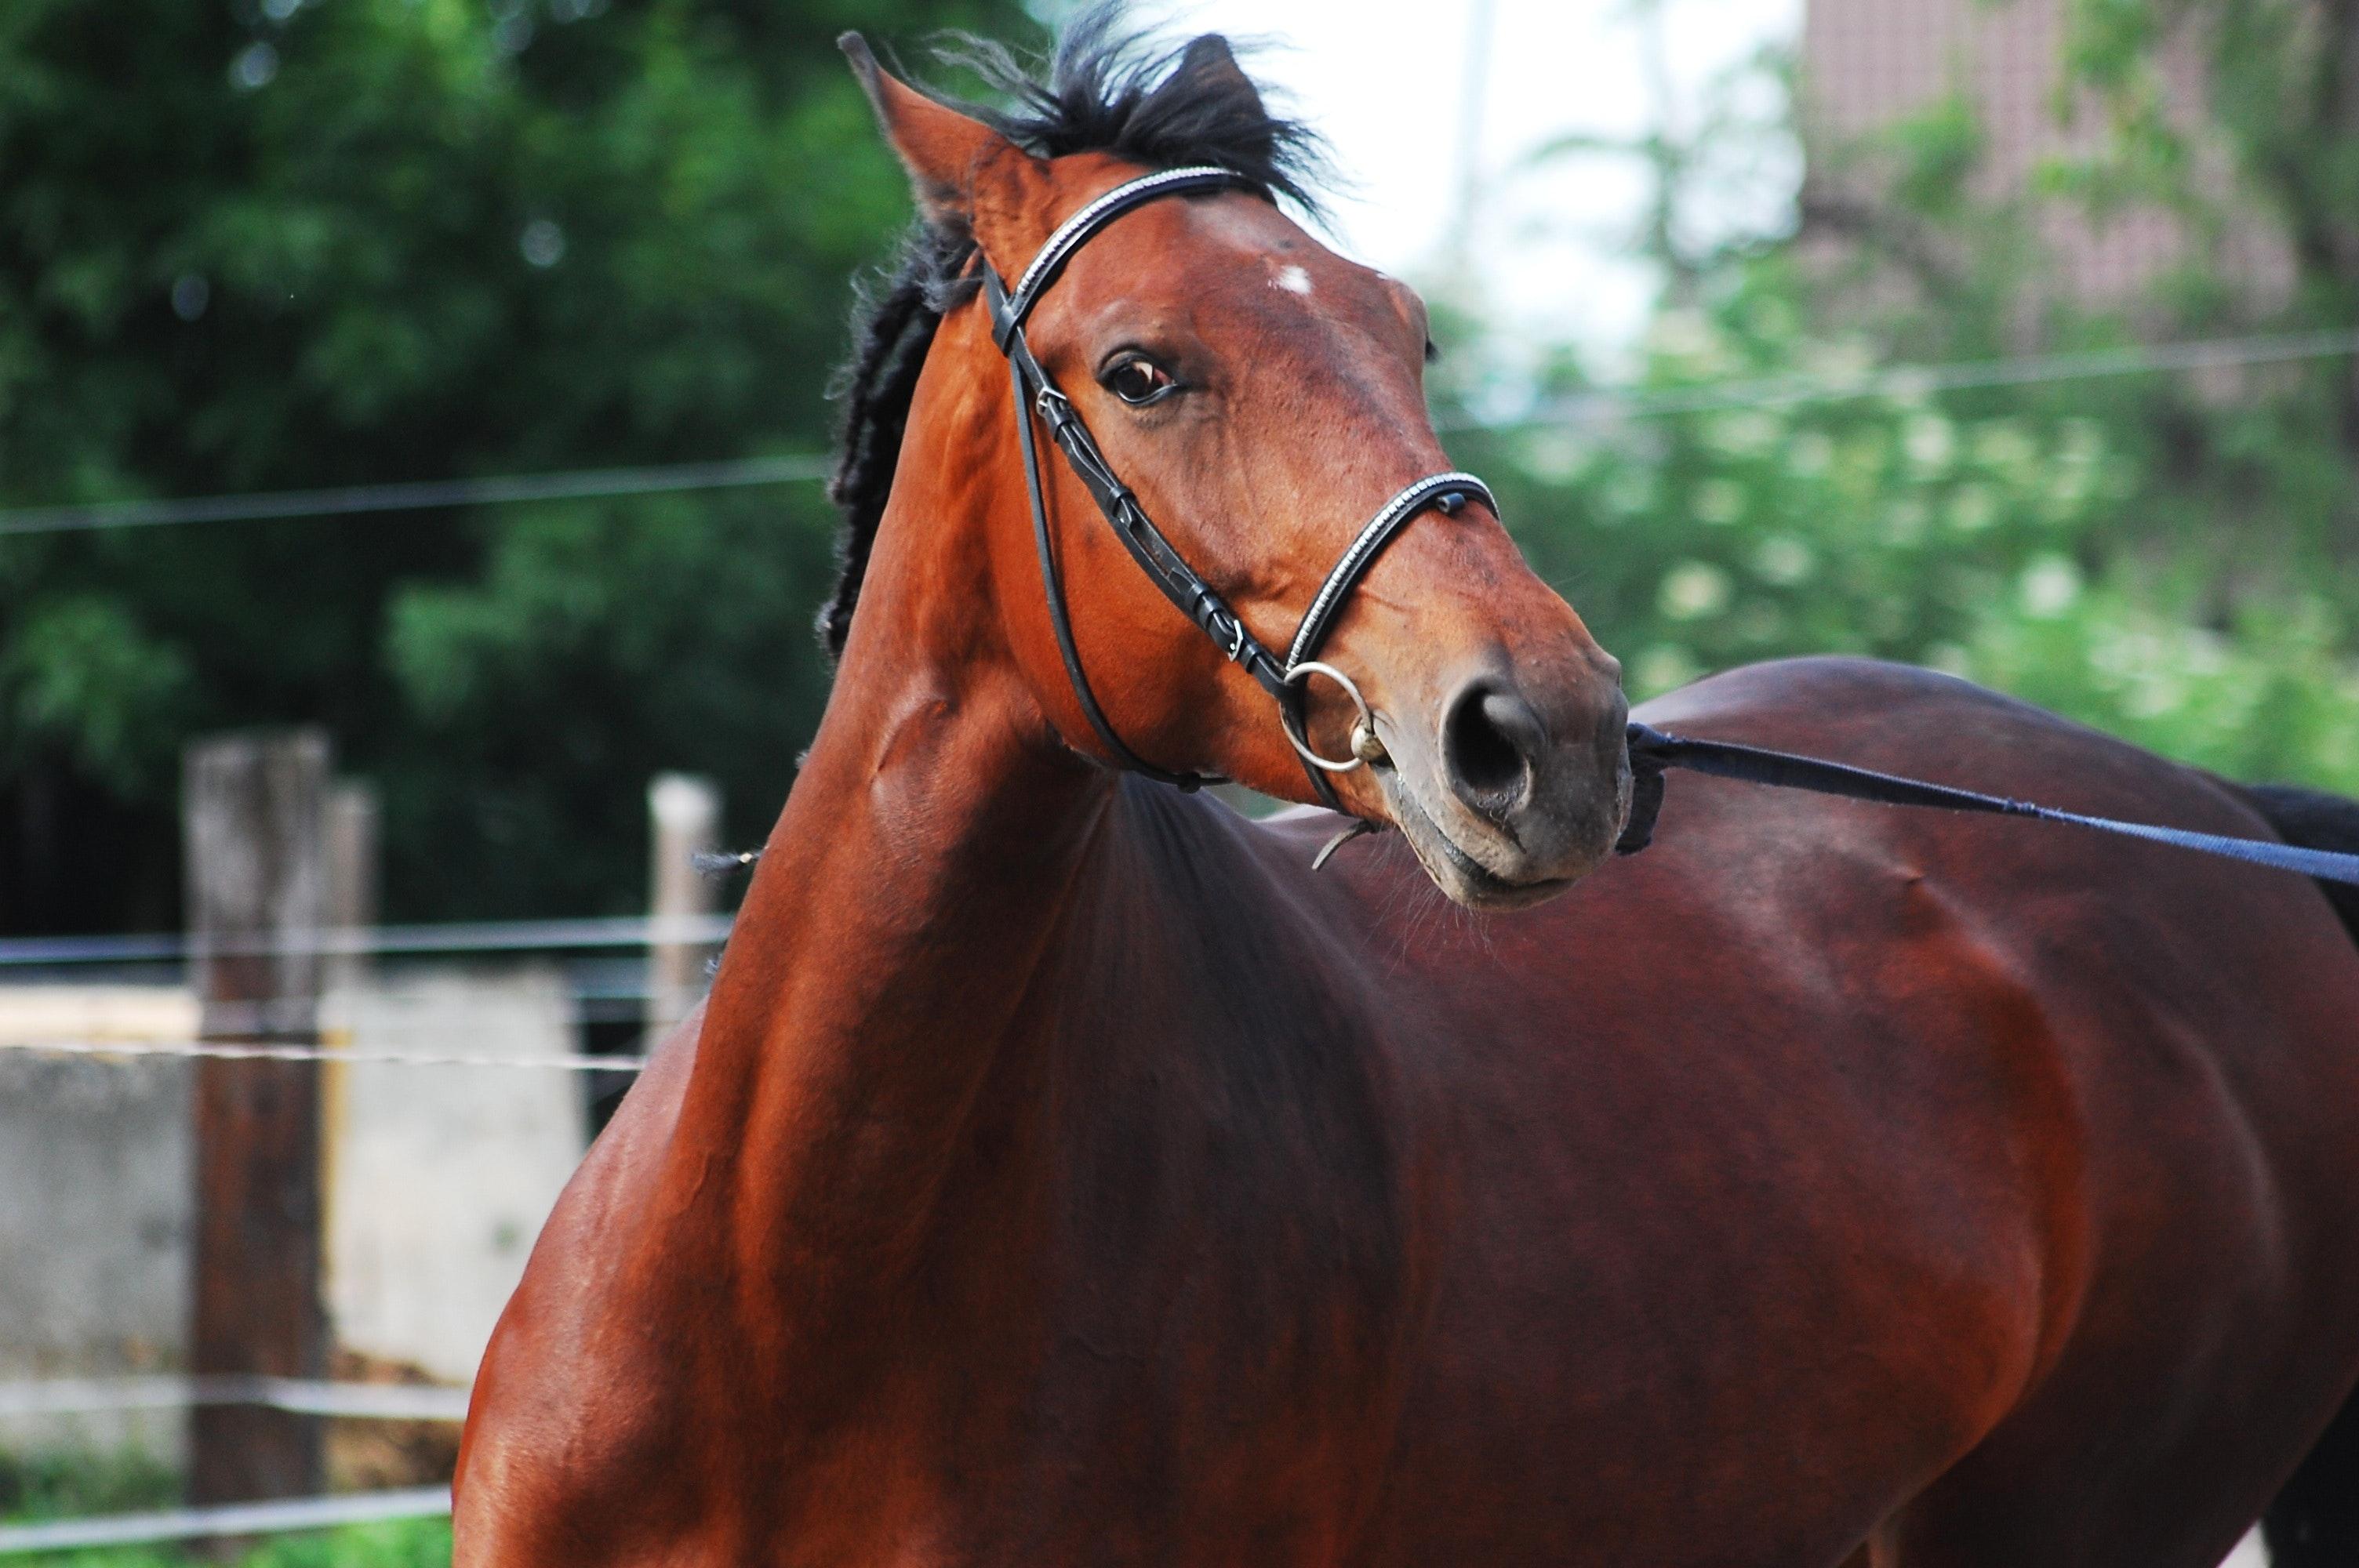 Horse Backriding Race 183 Free Stock Photo